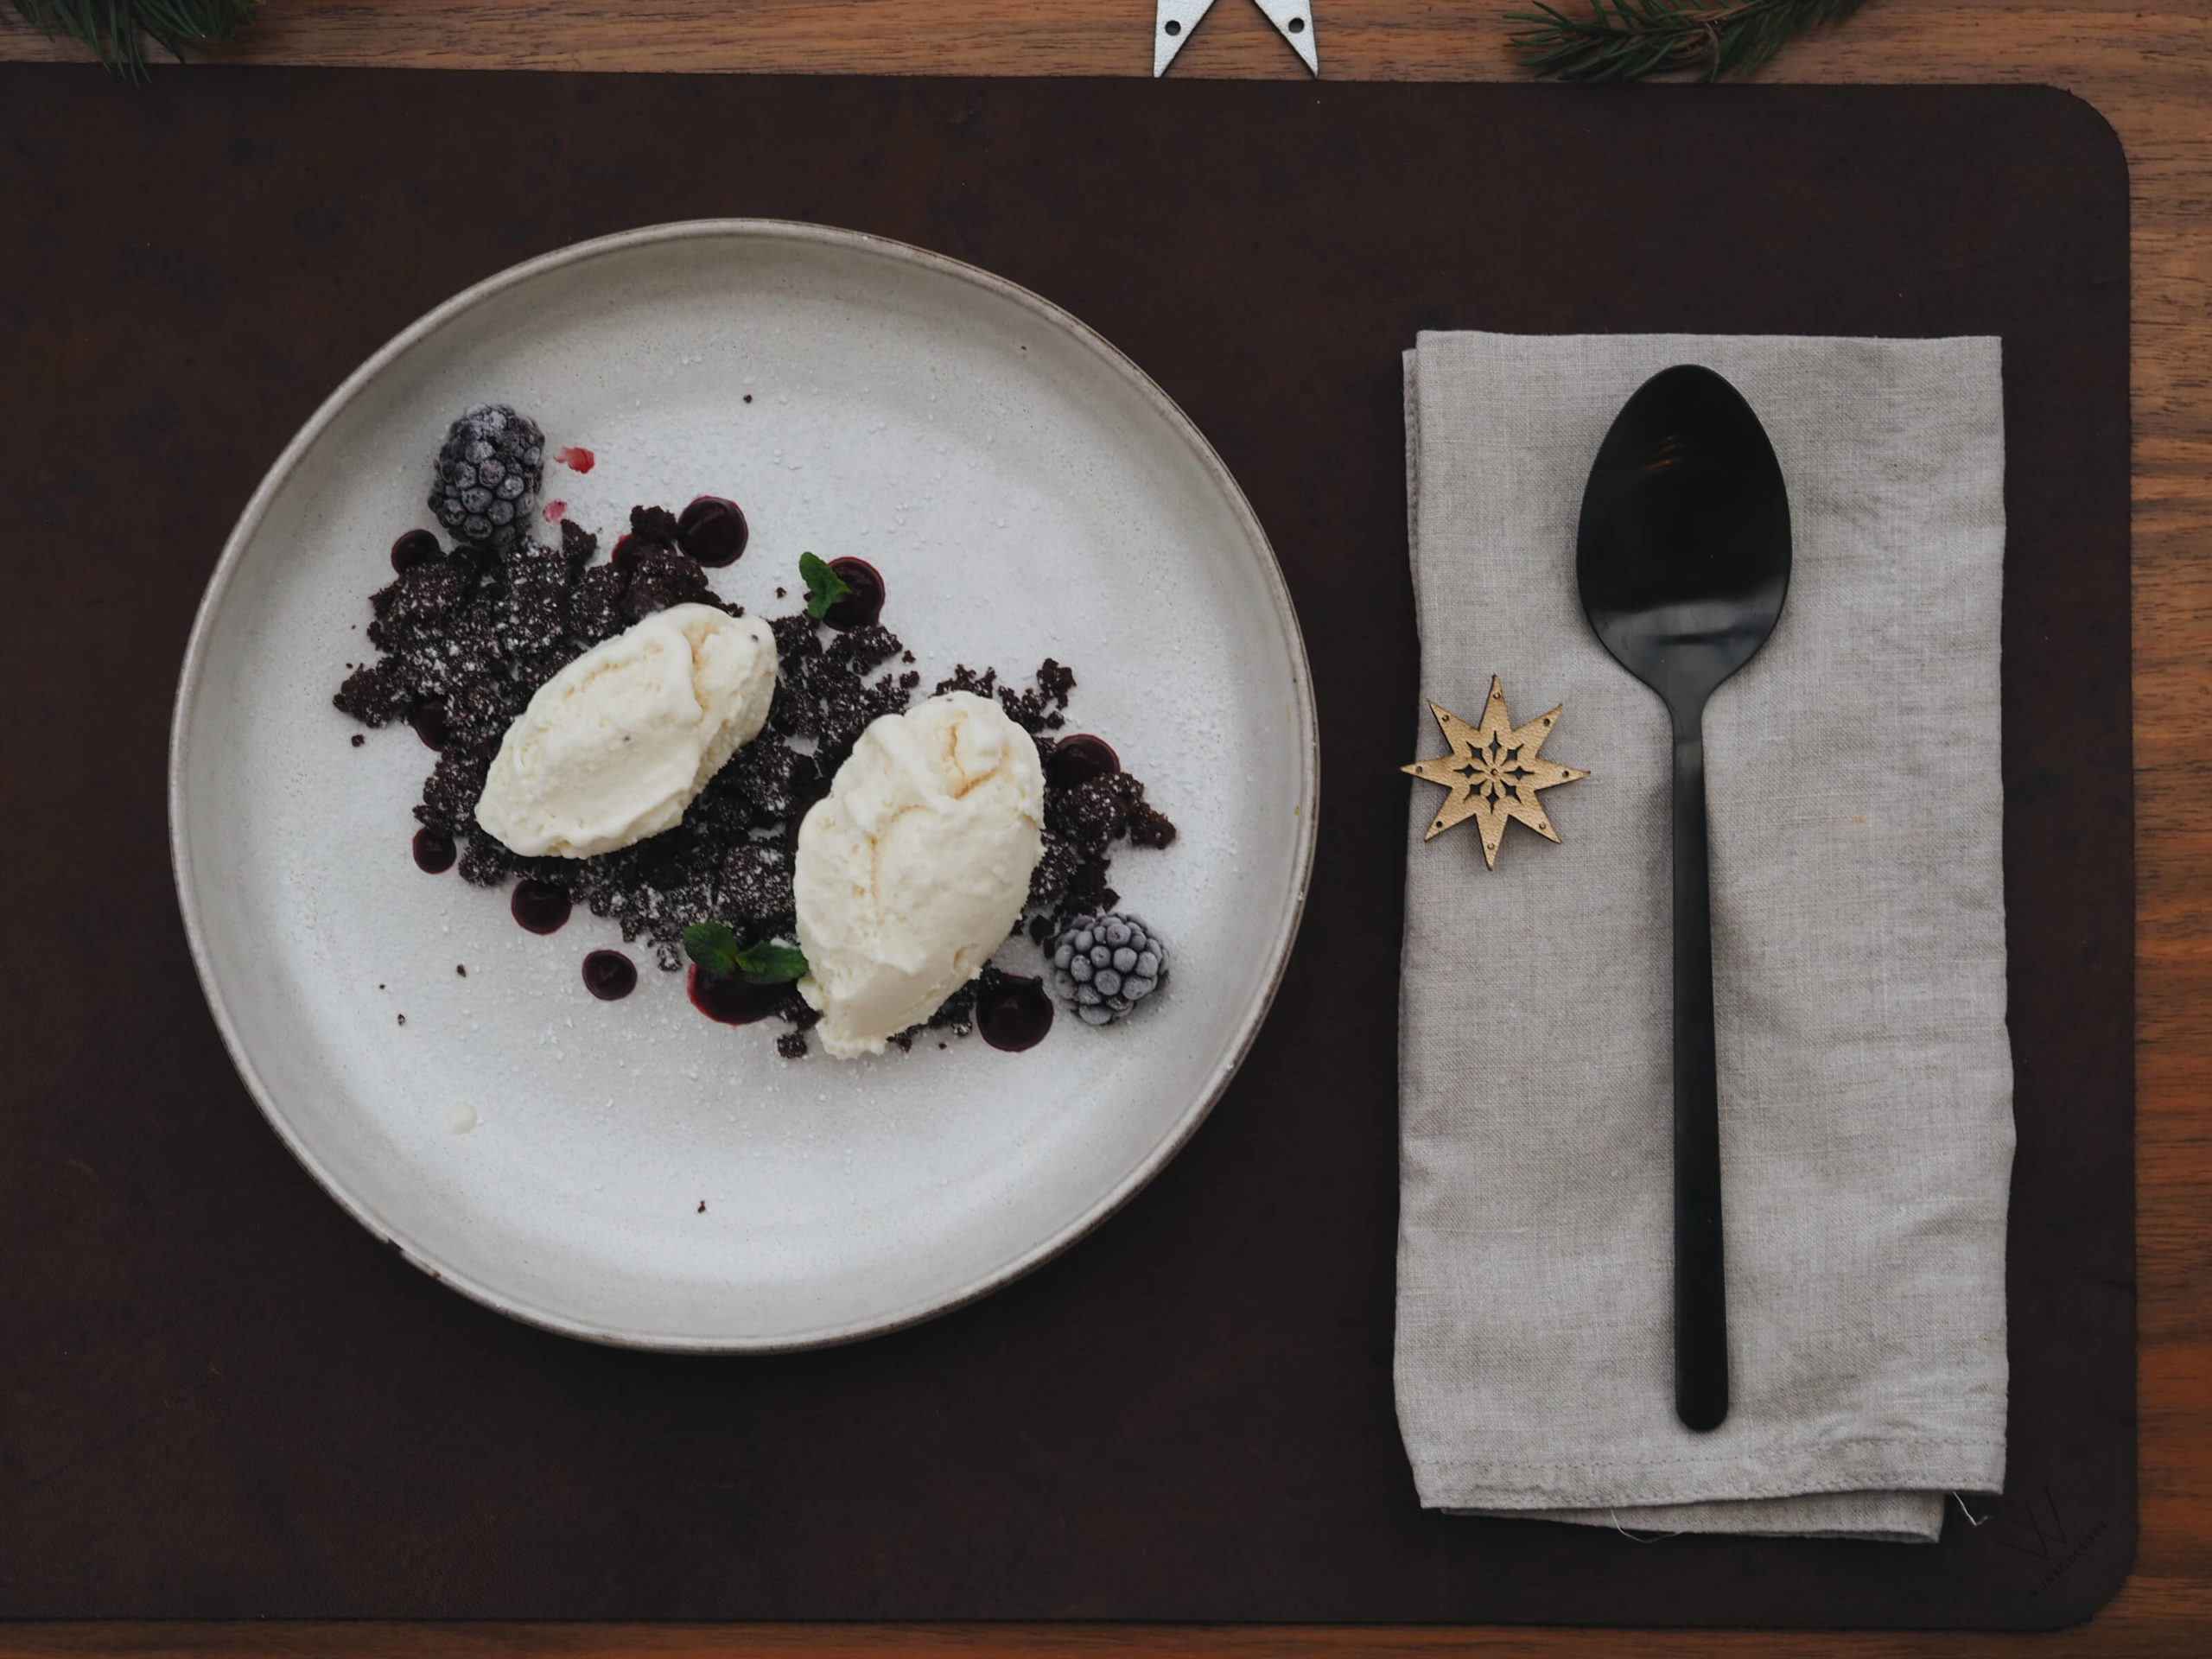 Weihnachtsdessert |Vanilleeis |Schokolade |Beeren